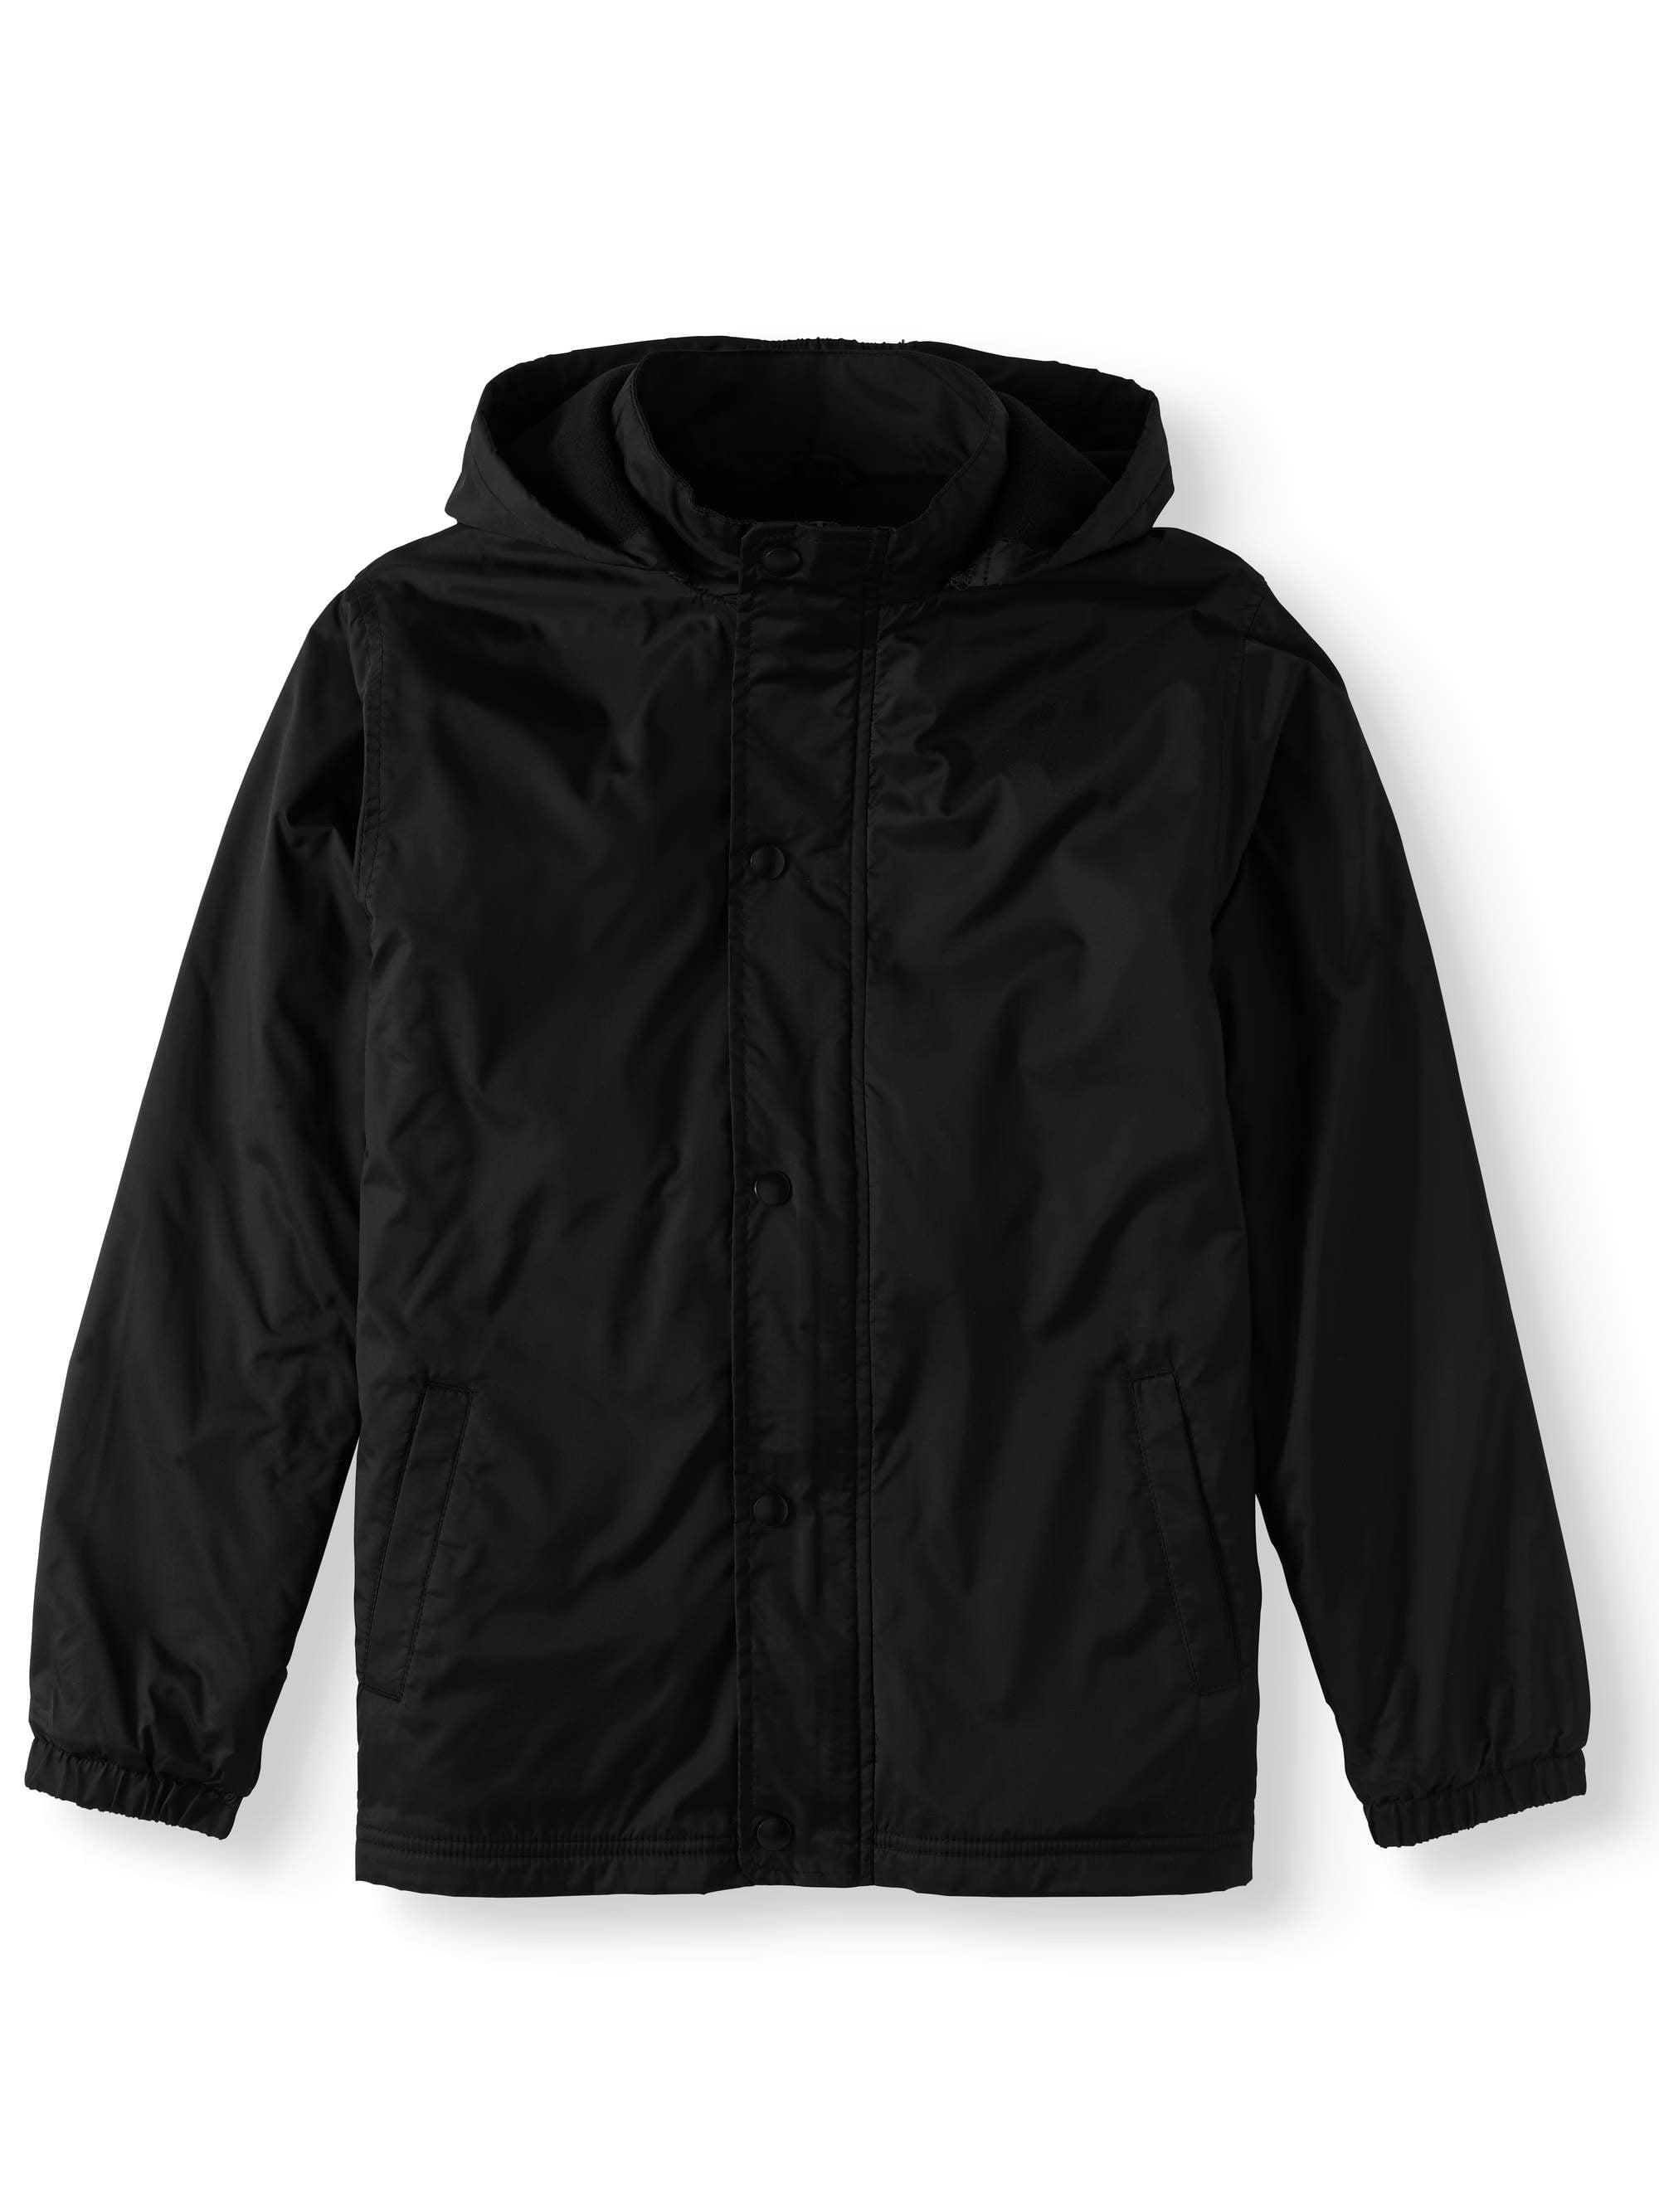 Boys School Uniform Removable Hood Jacket